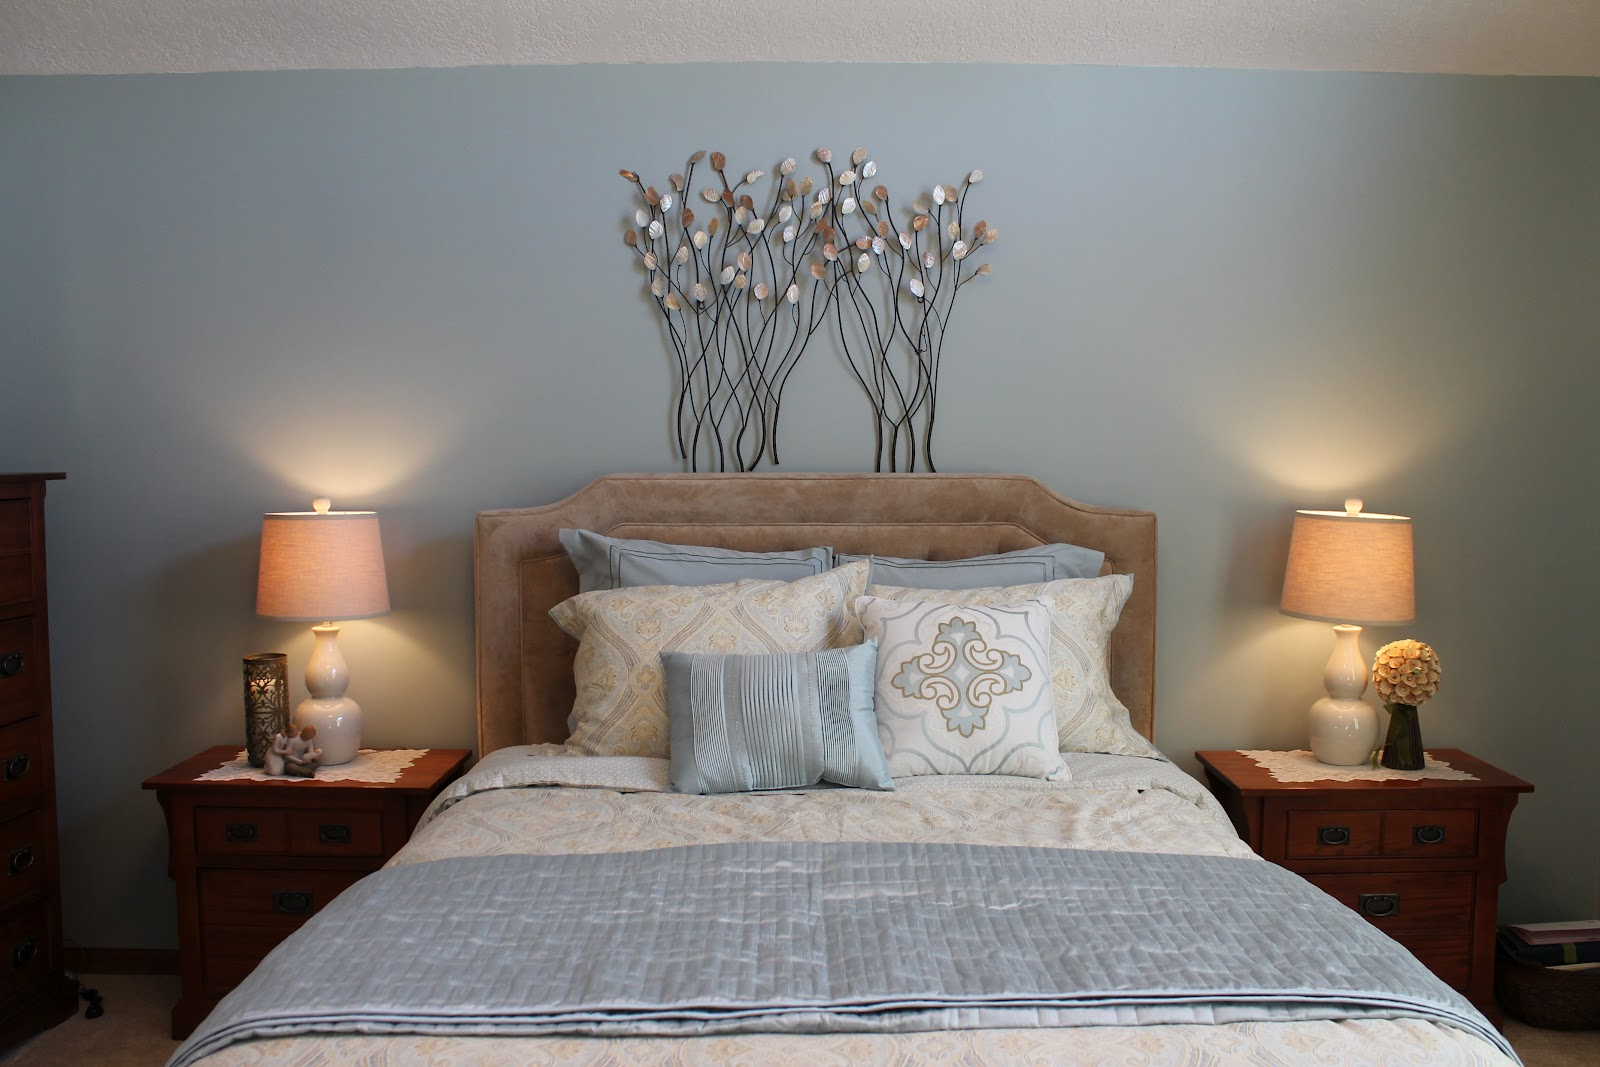 Demorest designs calm and serene master bedroom for Calm and serene bedroom ideas